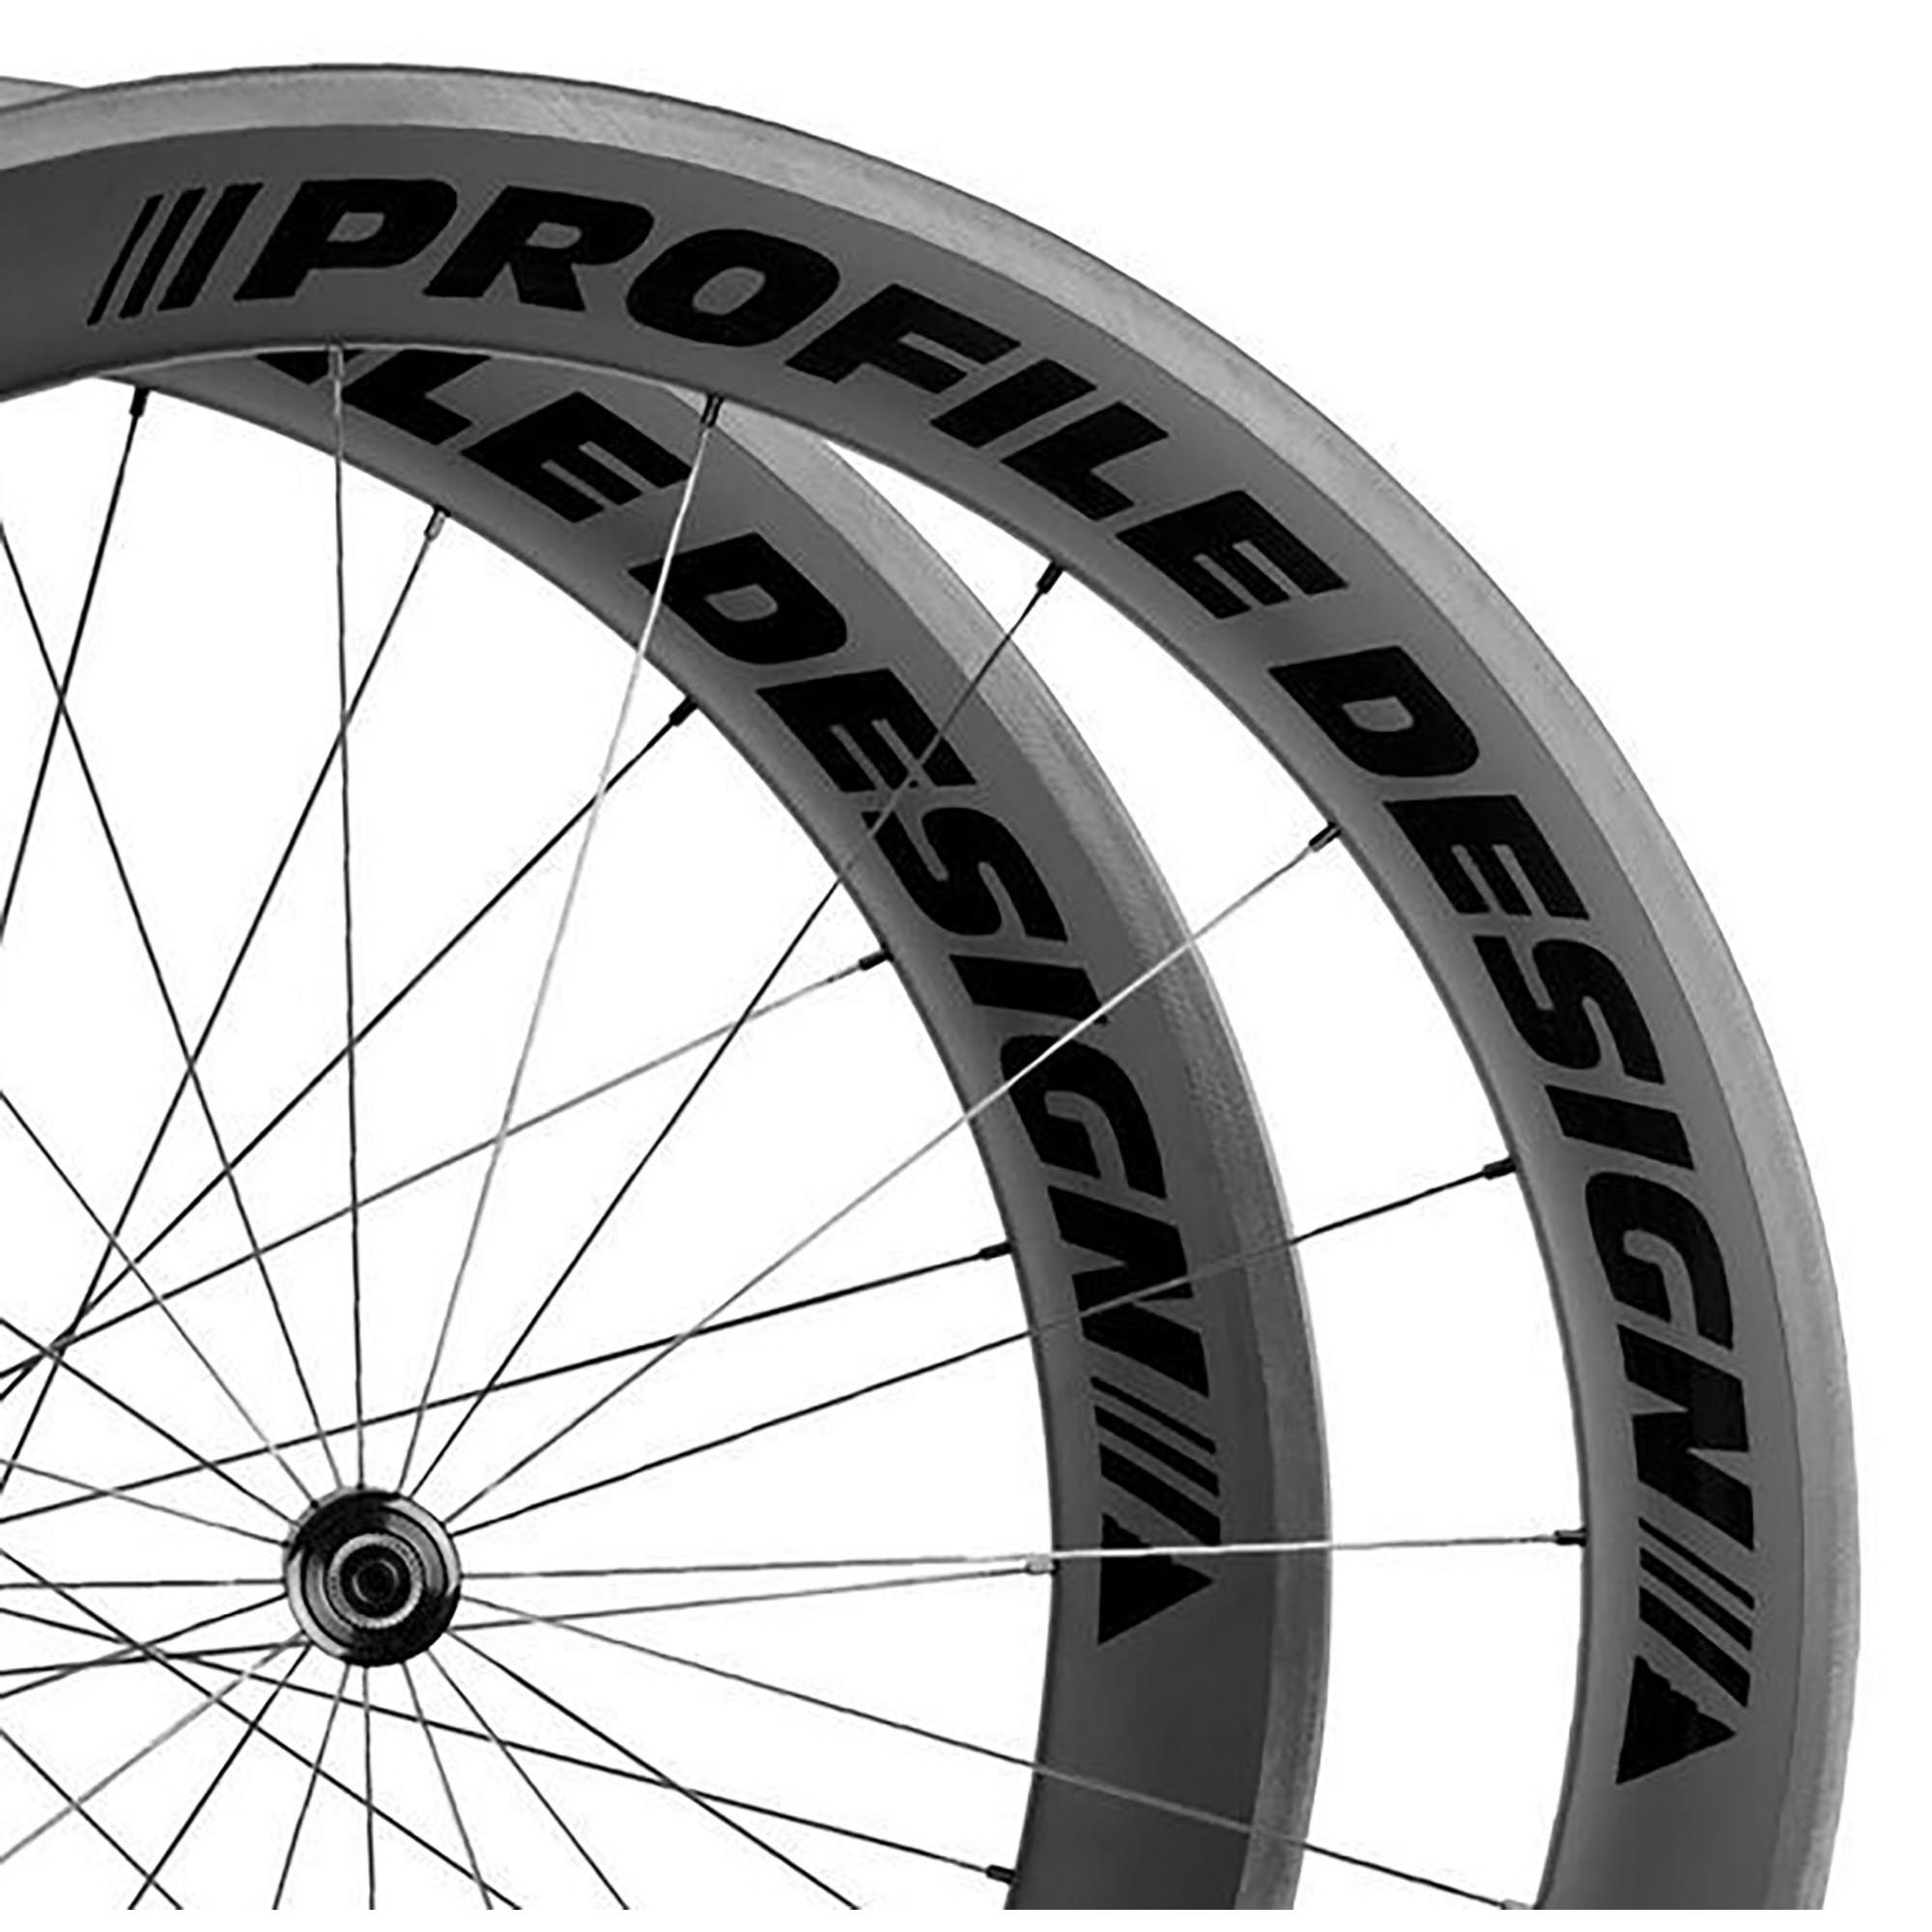 paire-de-roues-profile-design-58-twentyfour-disc-veloseine